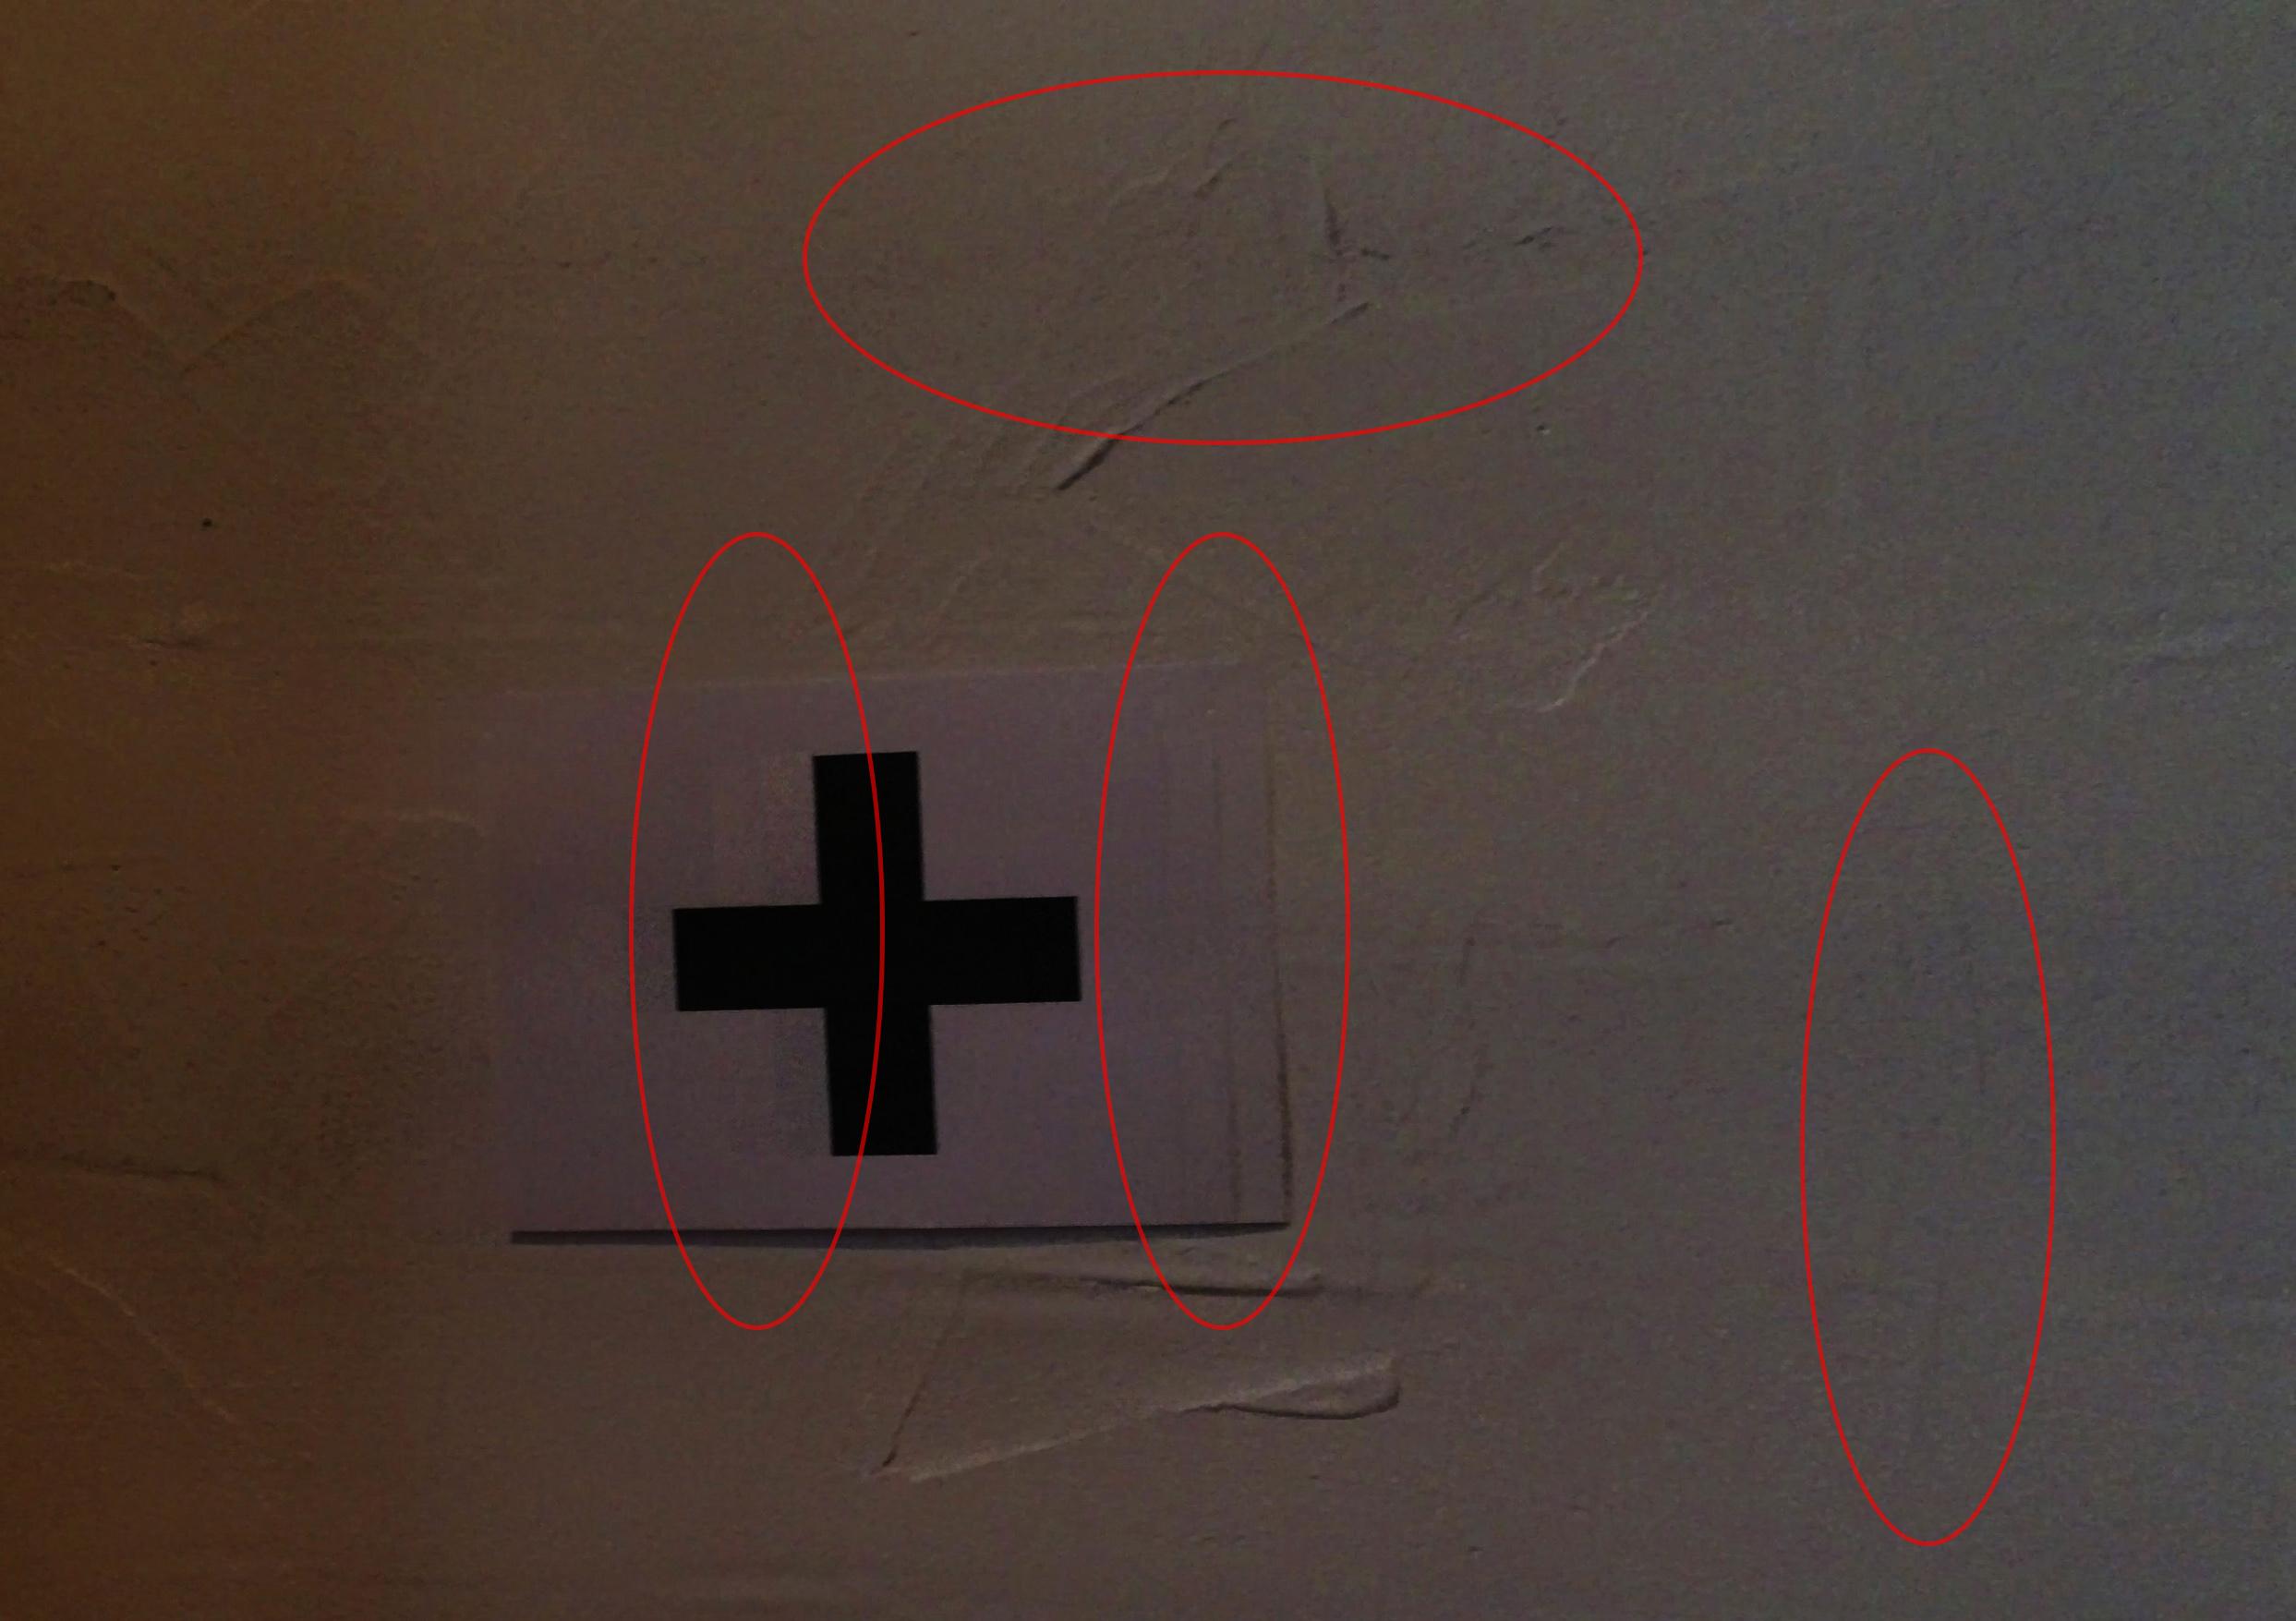 dji-p4p-ghosting.jpg